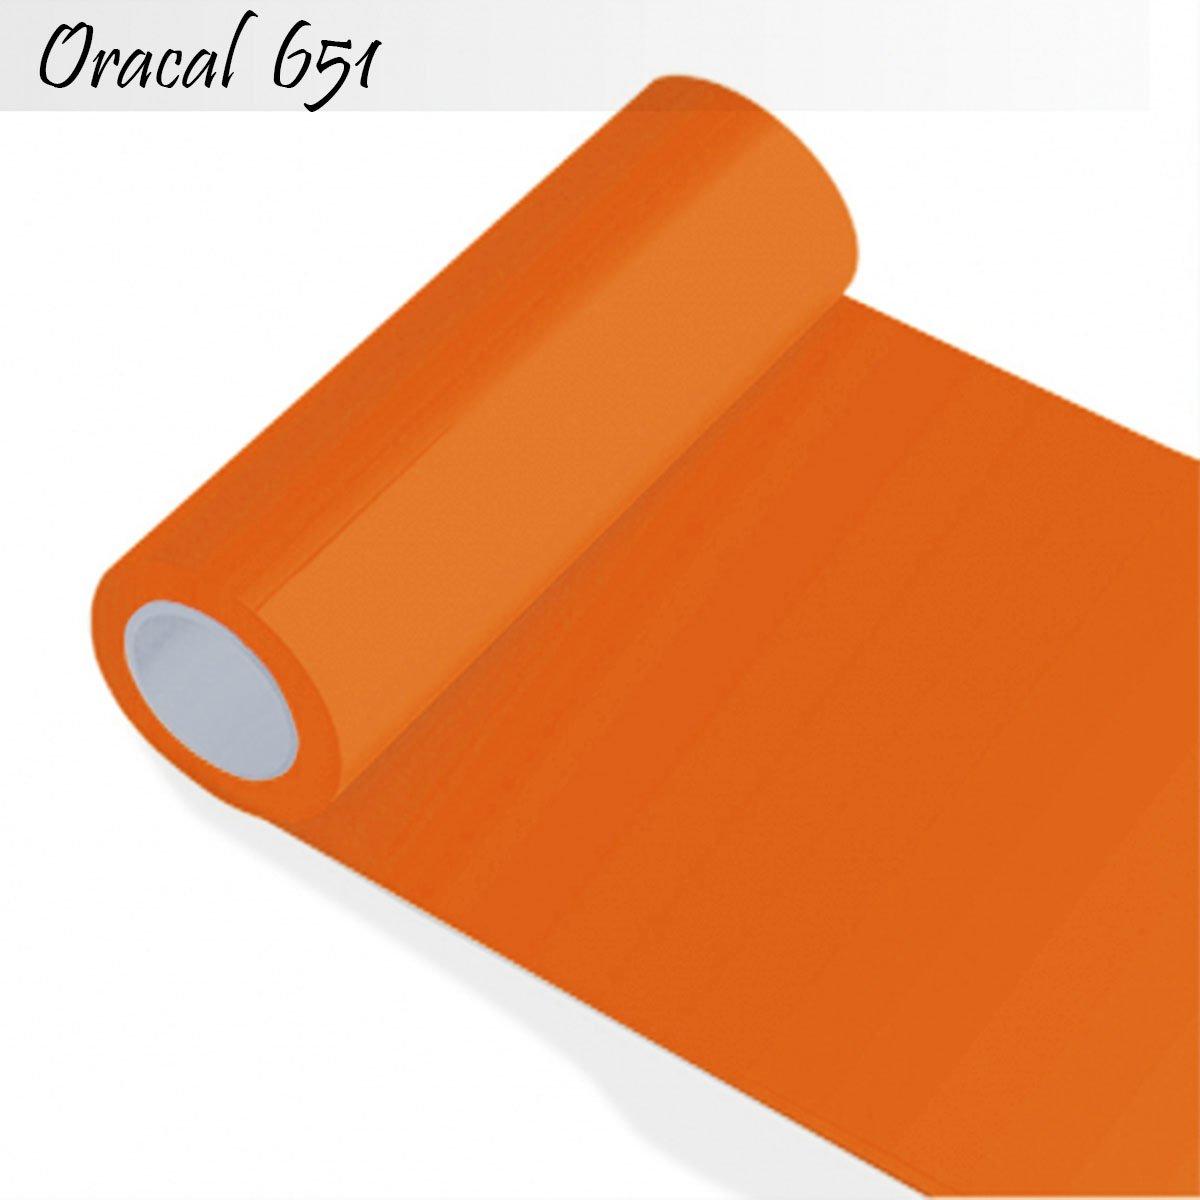 Oracal 651 - Orafol Folie 10m (Laufmeter) freie Farbwahl Farbwahl Farbwahl 55 glänzende Farben - glanz in 4 Größen, 63 cm Folienhöhe - Farbe 70 - schwarz B00TRTEMN6 Wandtattoos & Wandbilder e21297